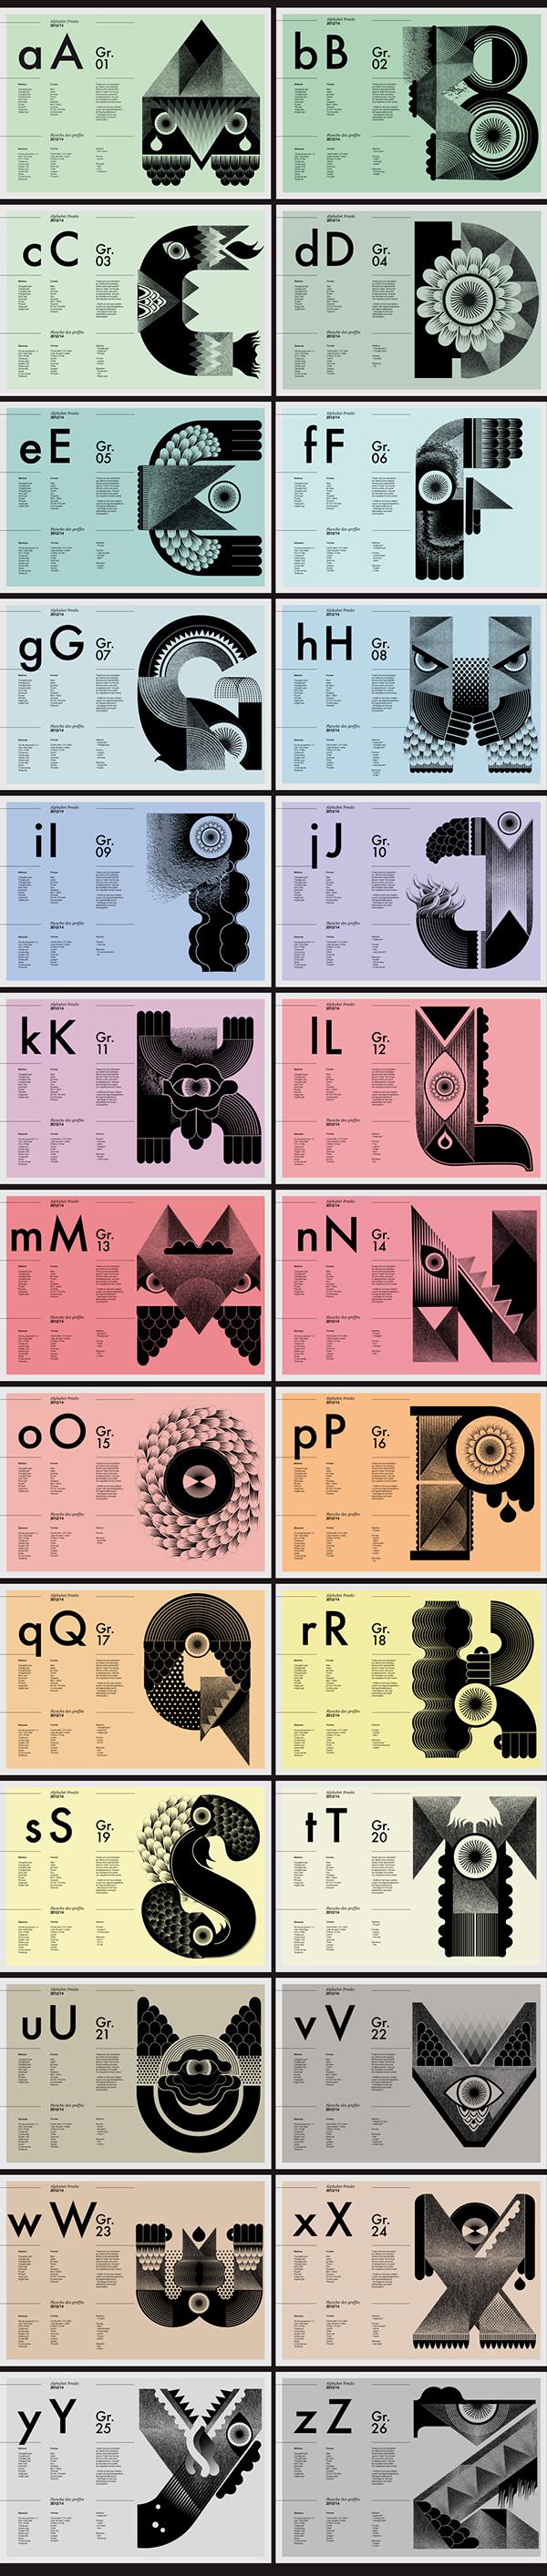 best creative typeface designs